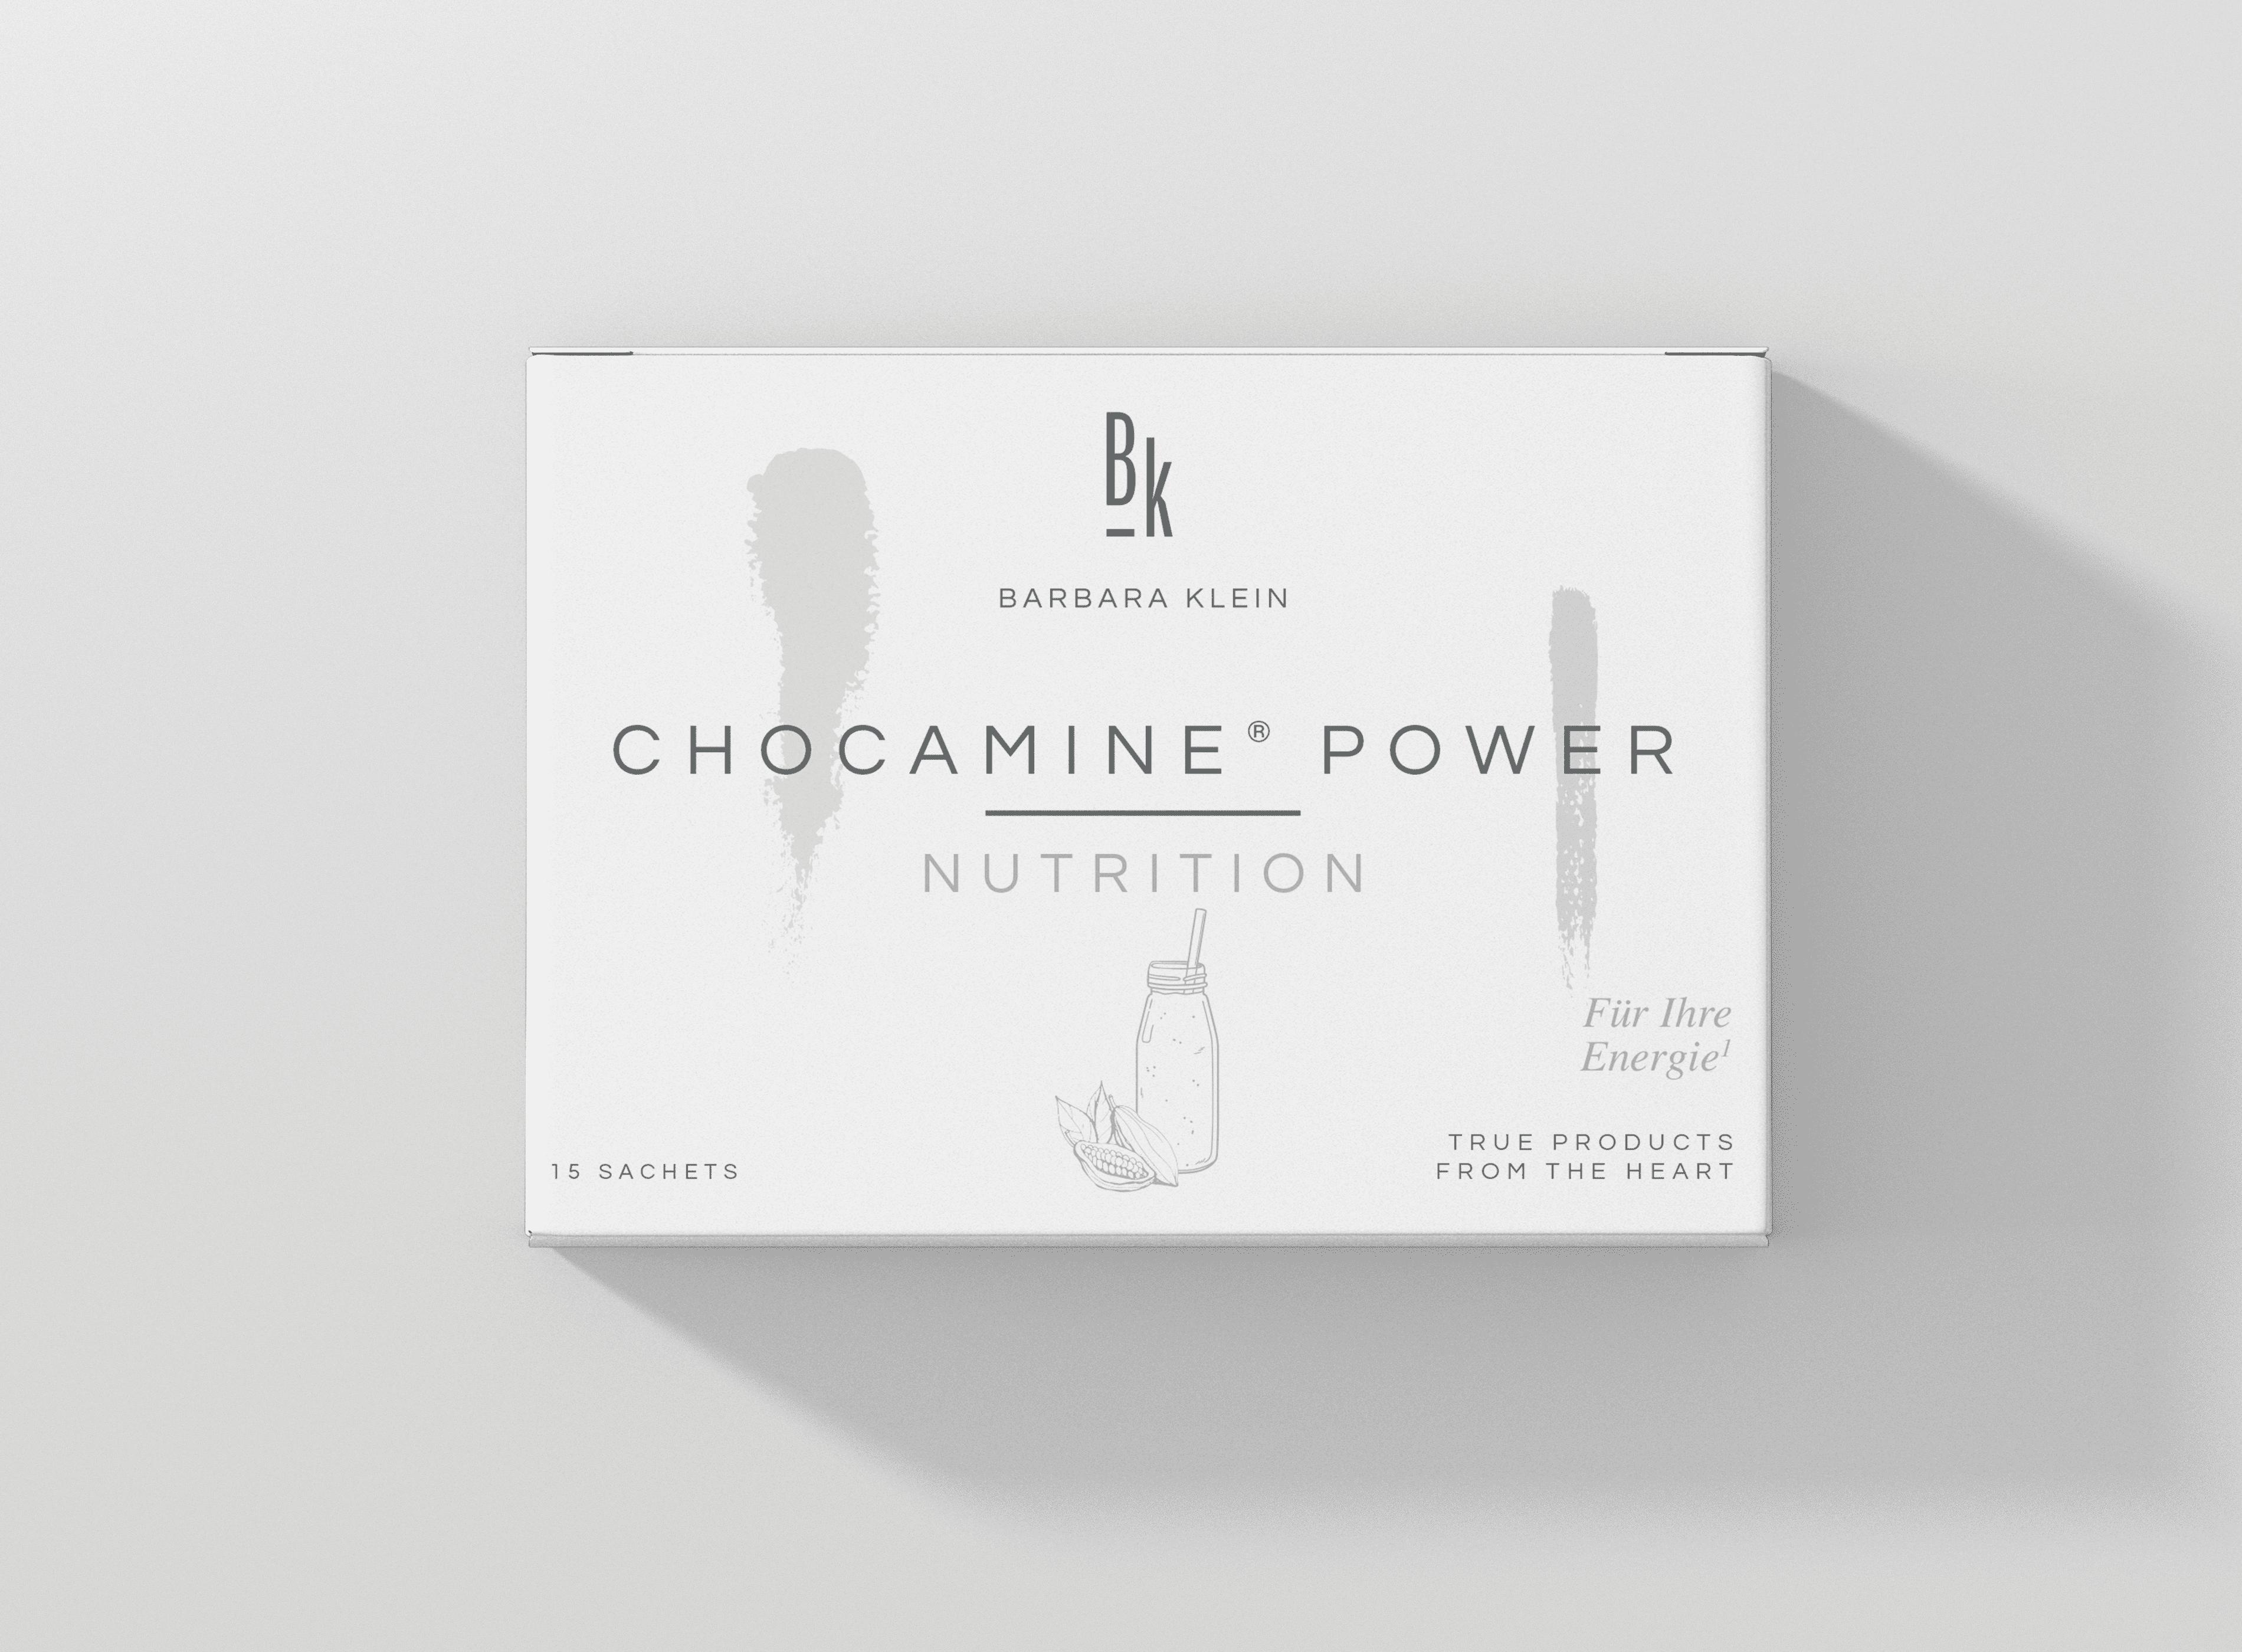 CHOCAMINE® POWER